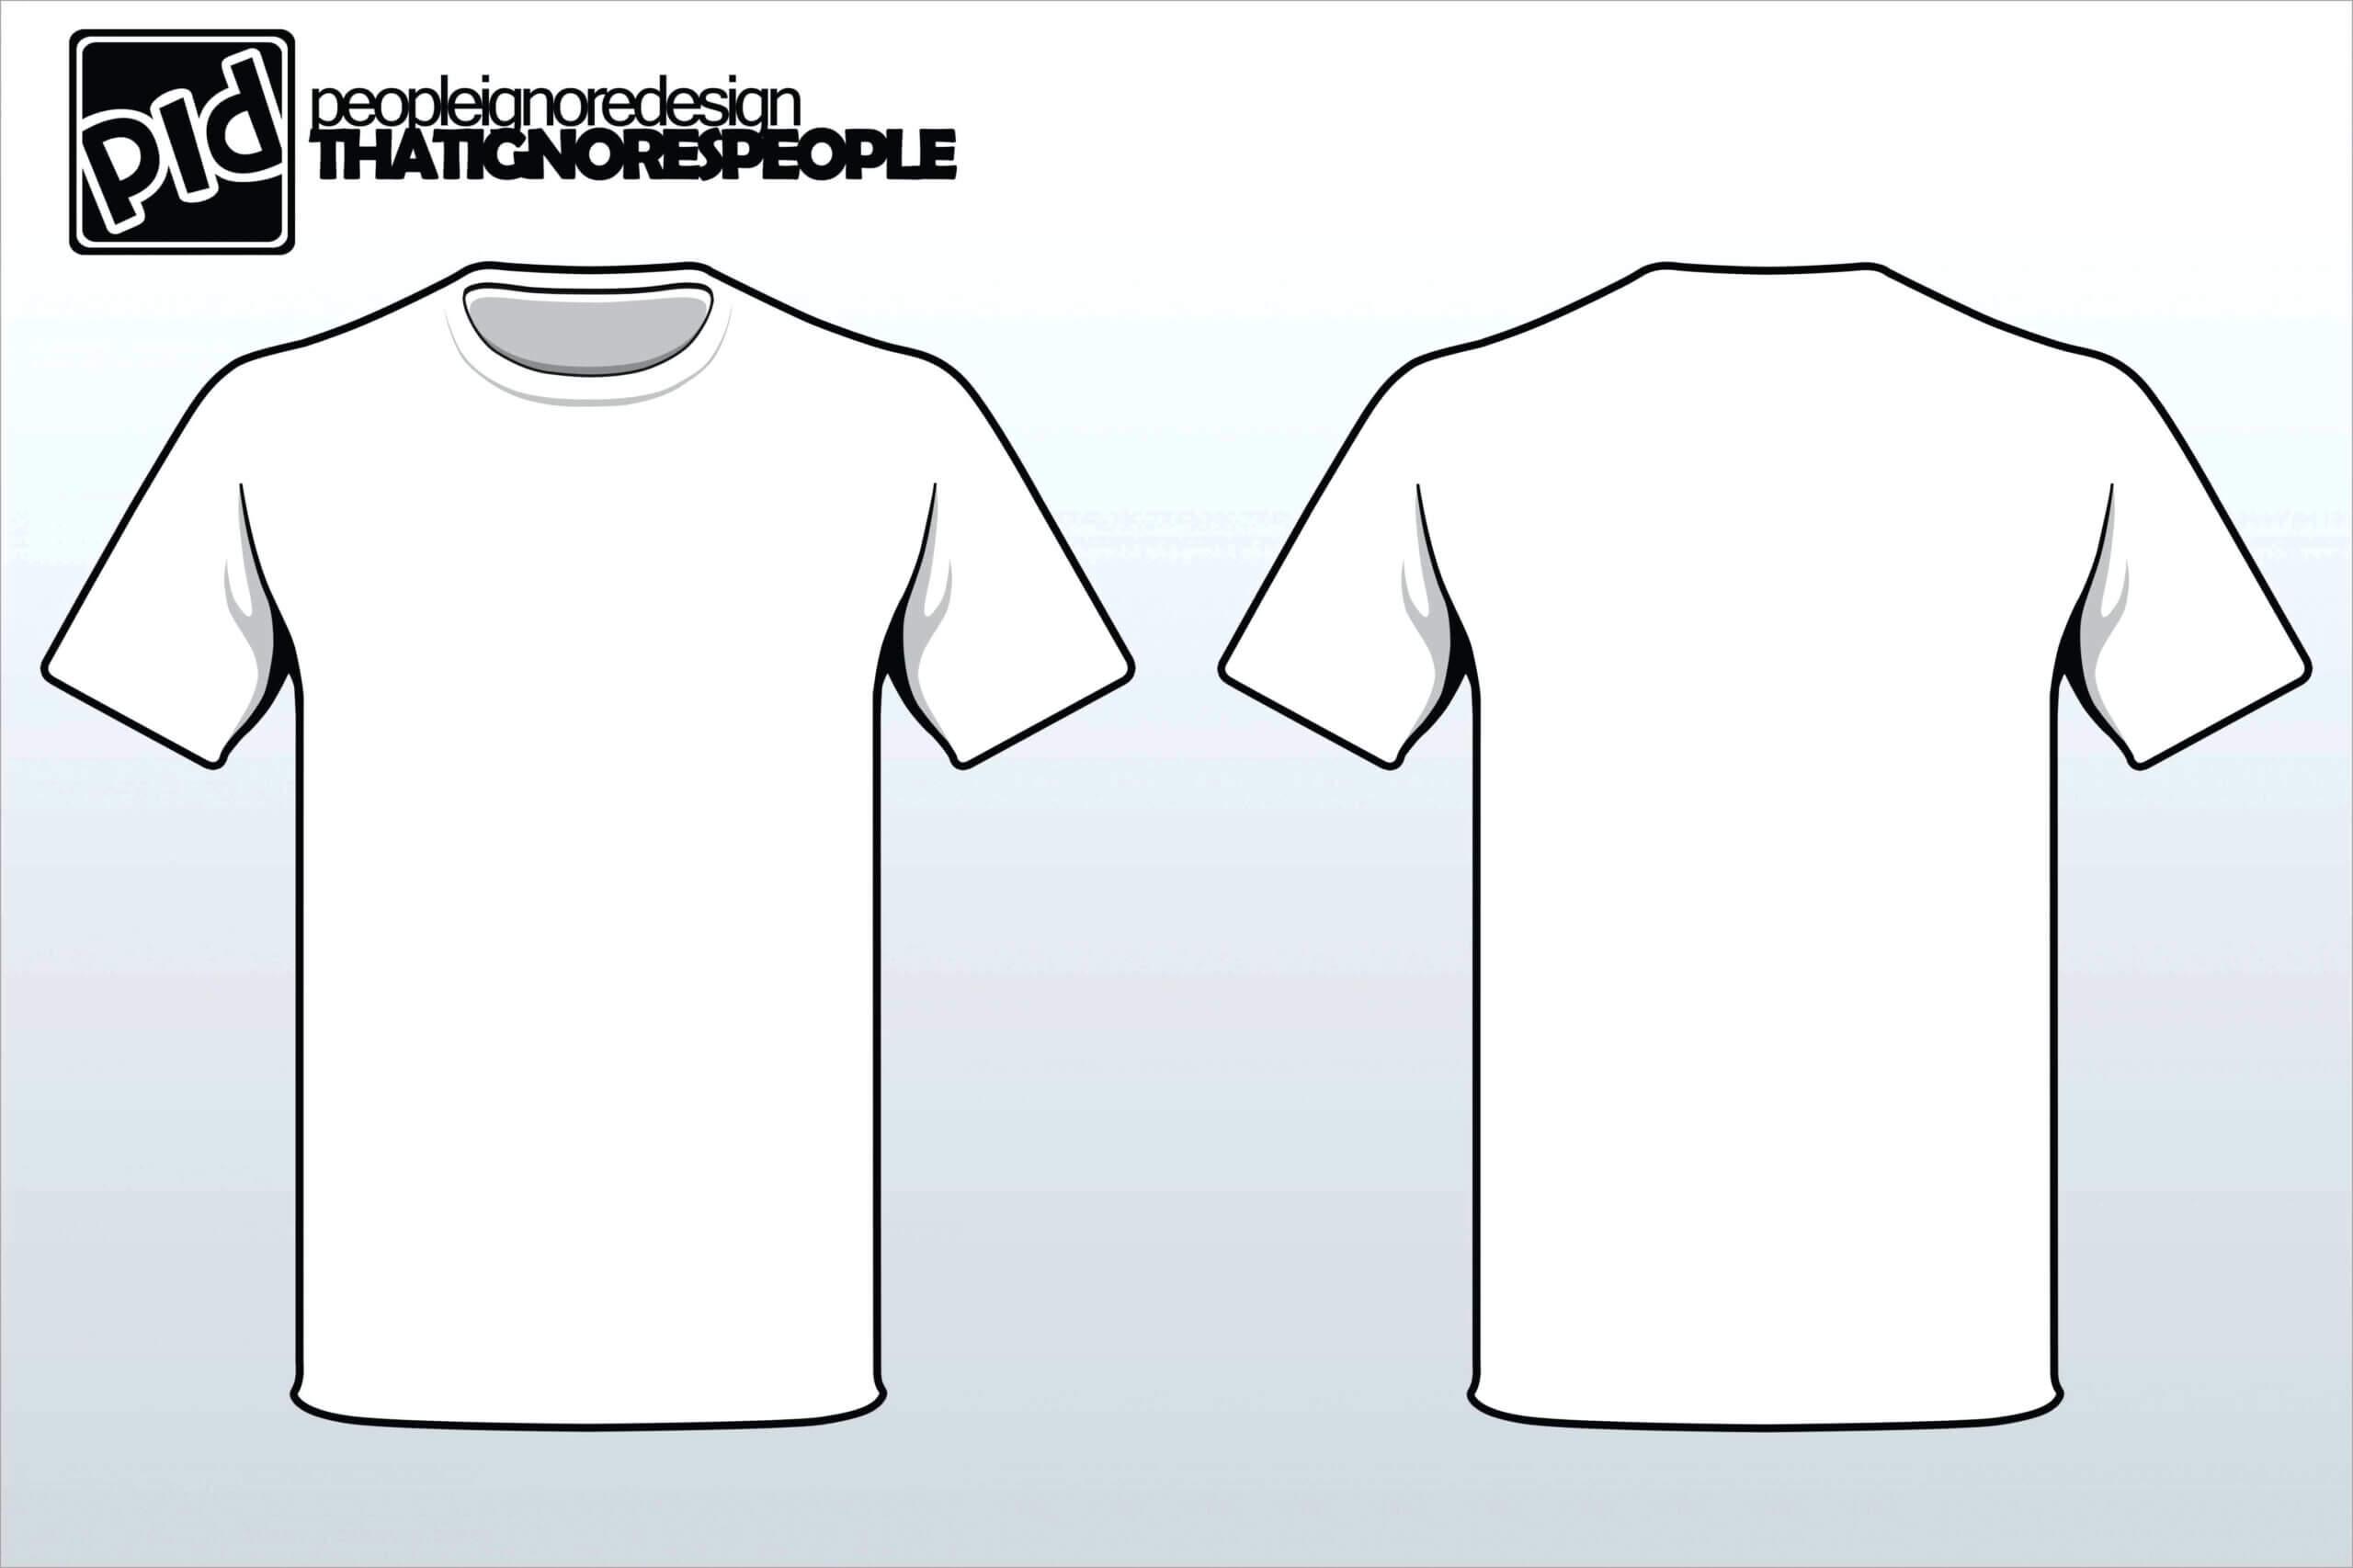 037 T Shirt Design Template Free Download Beautiful Printing Pertaining To Blank T Shirt Design Template Psd